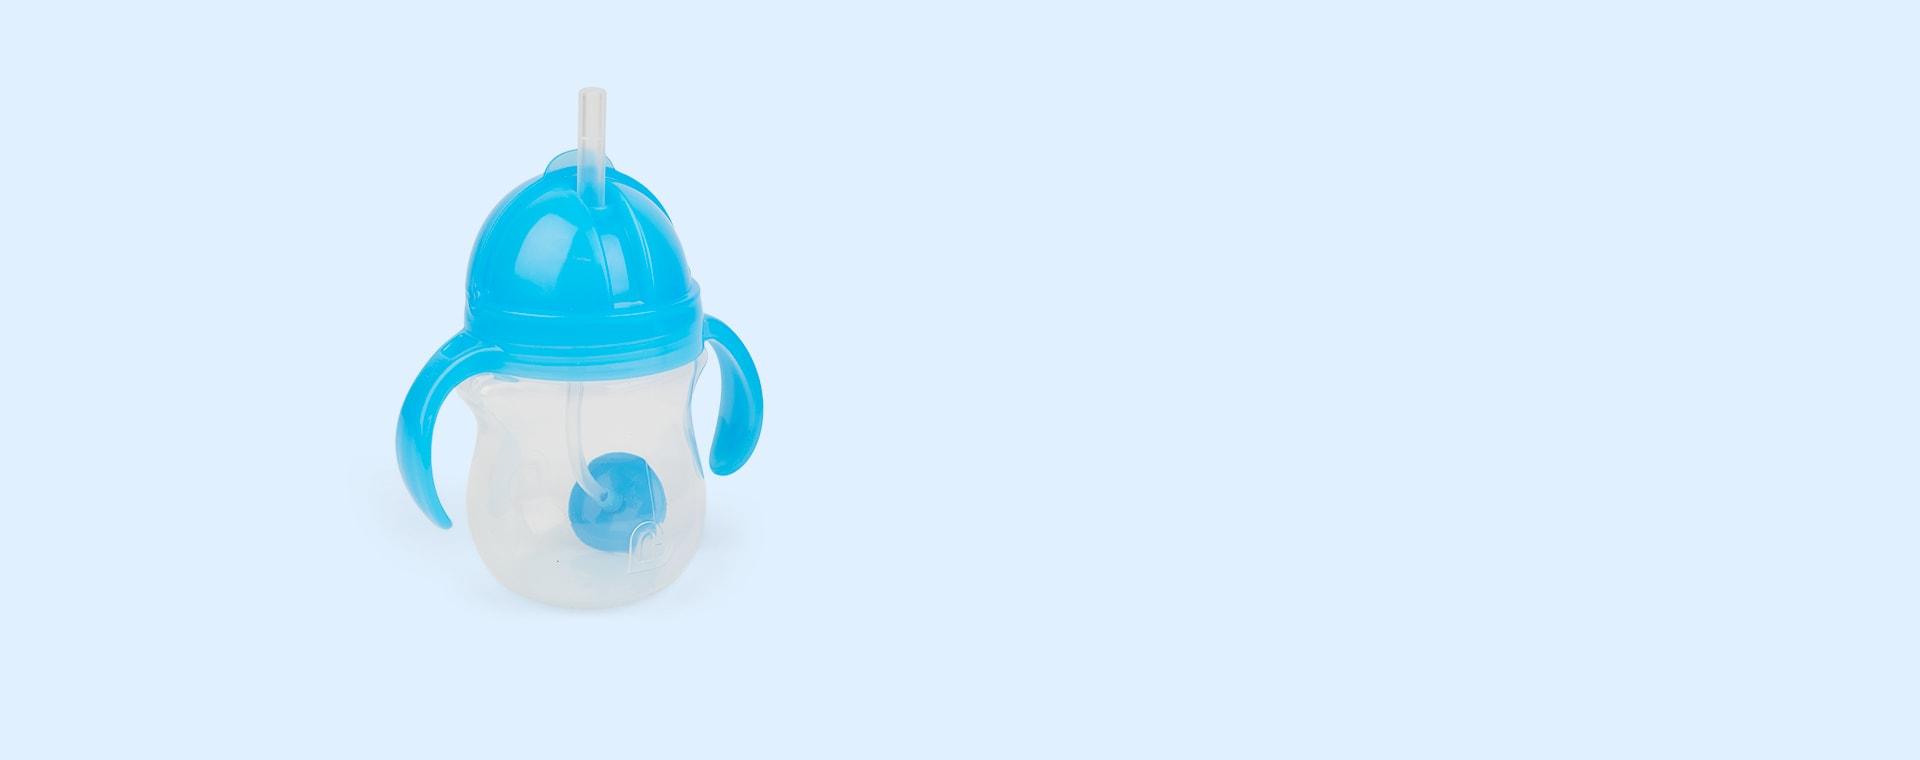 Blue Munchkin Be Happy Toddler Dining Set